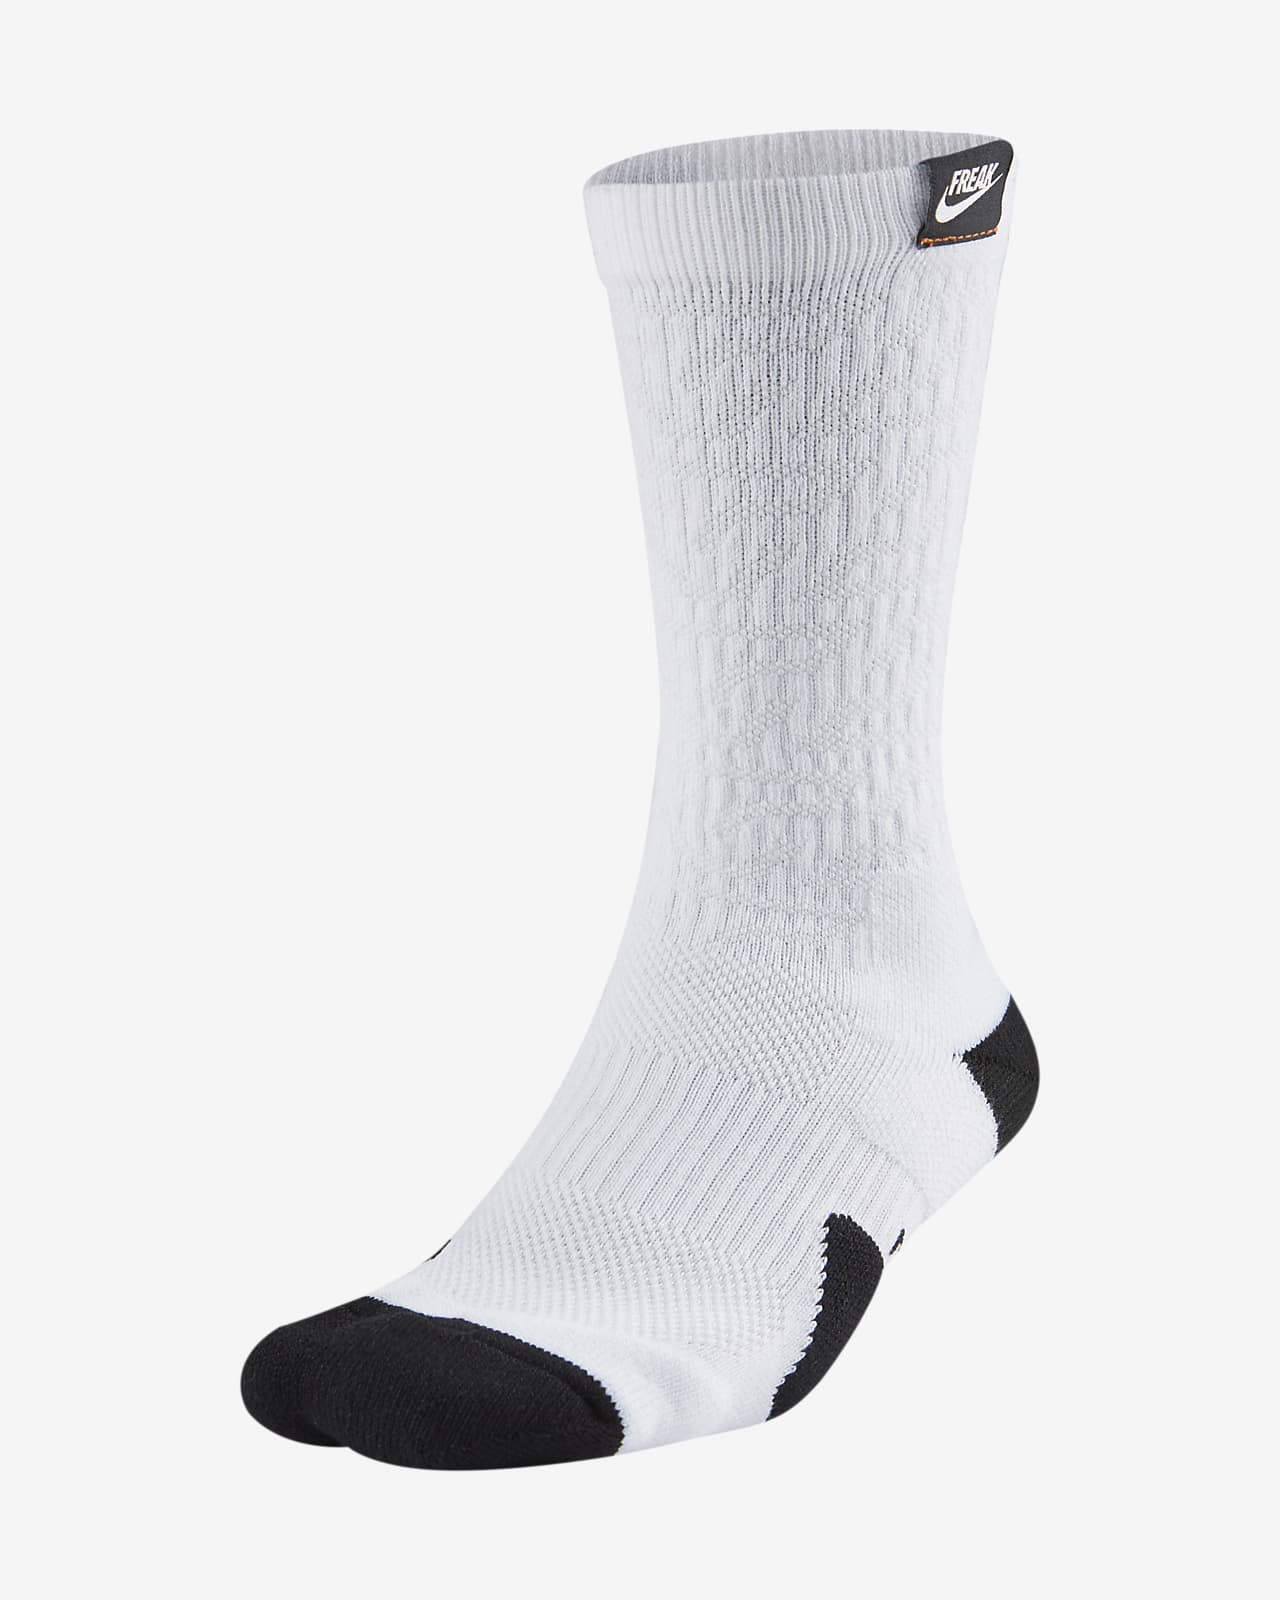 Giannis Nike Elite 篮球运动袜 (1双)